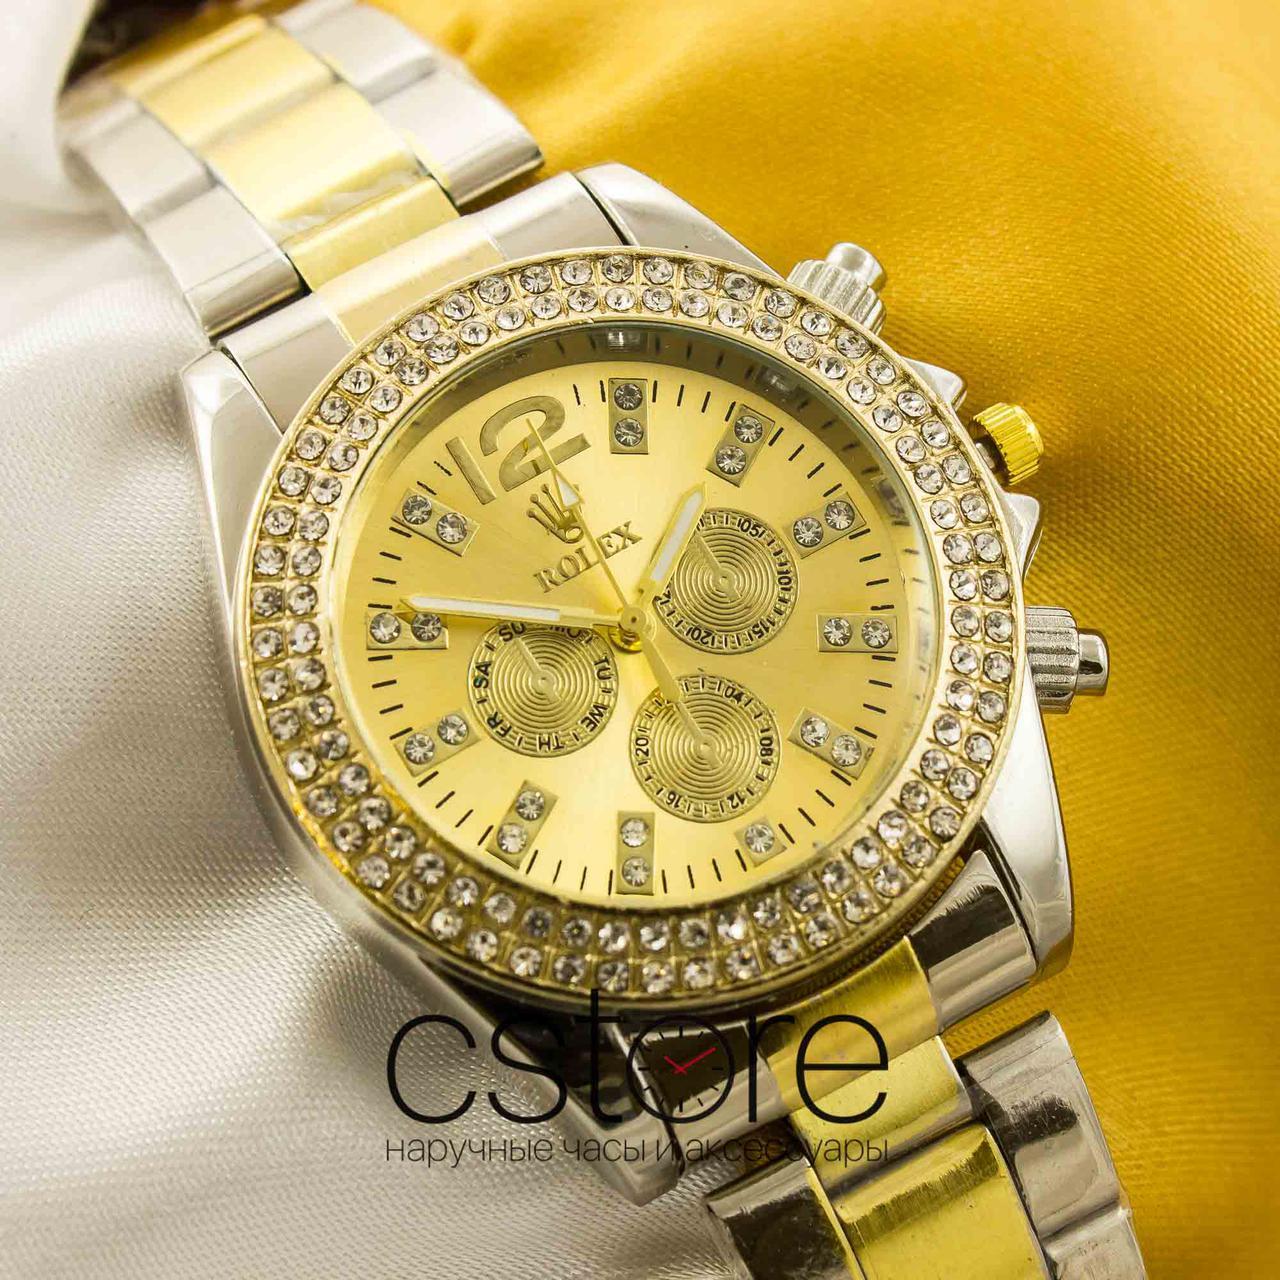 Женские наручные копия часы Rolex gold gold (05273) - megastore.net.ua 644ecf6358f03